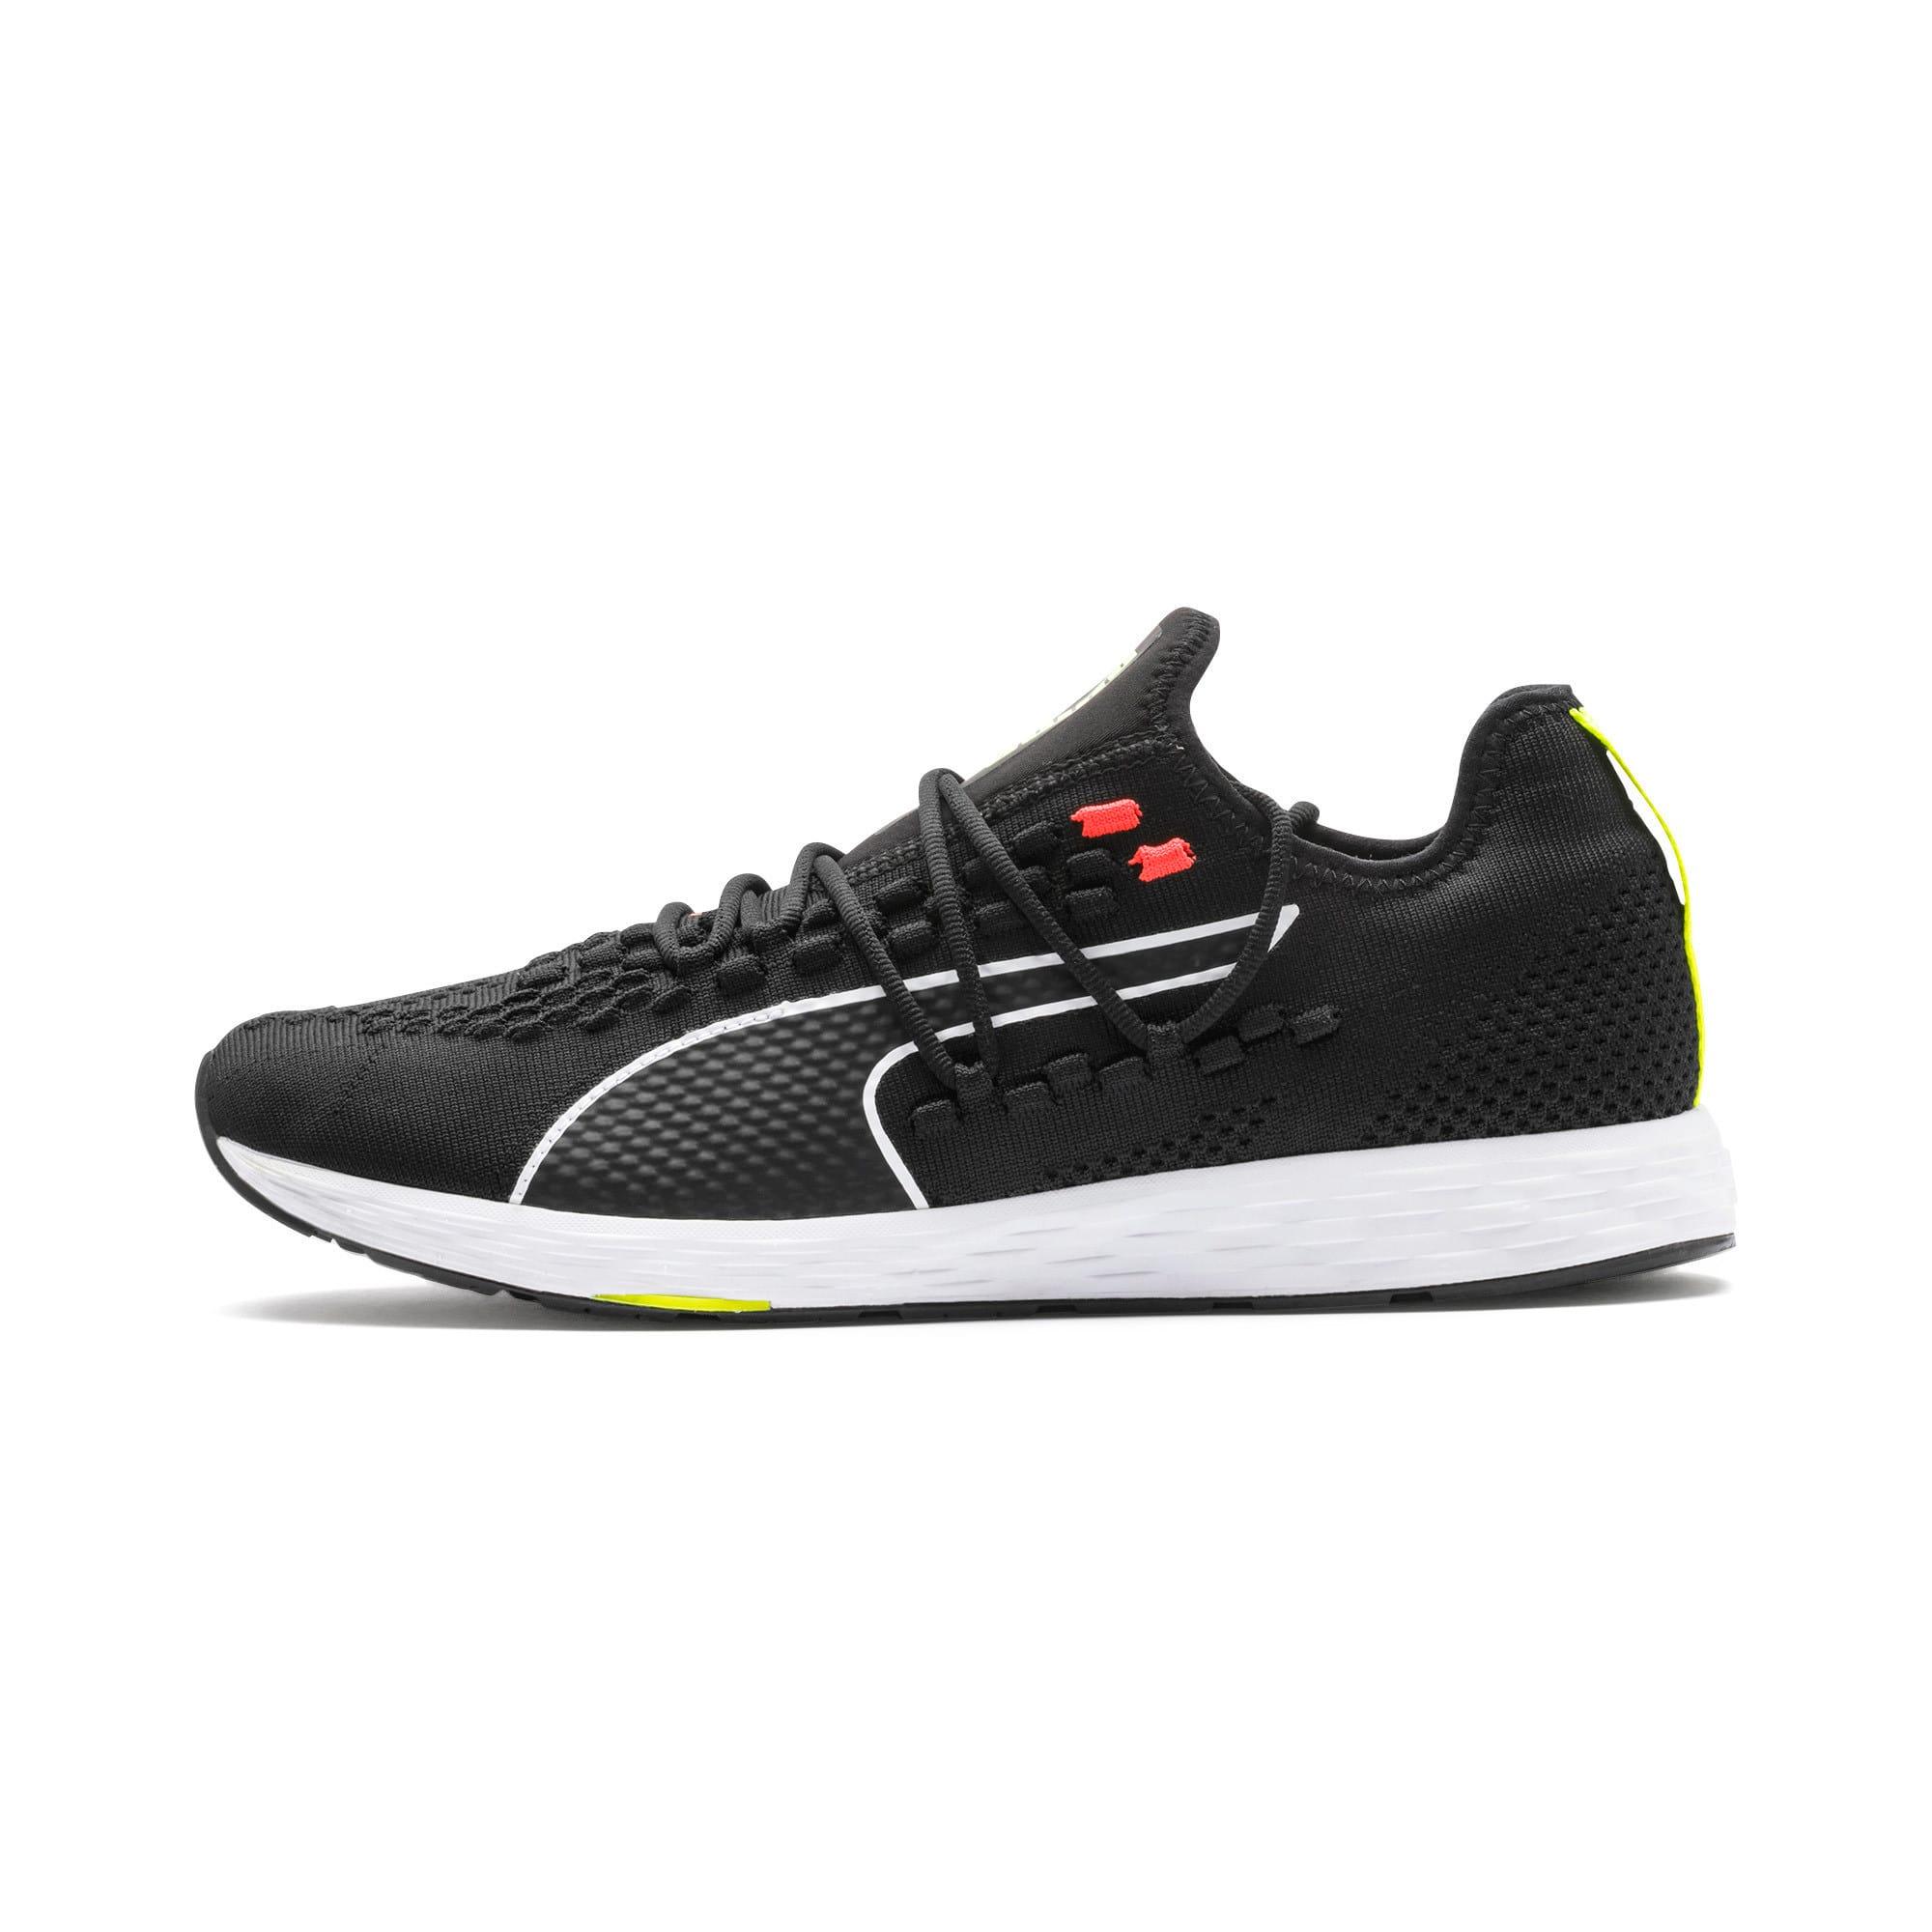 Thumbnail 1 of SPEED RACER Men's Running Shoes, Black-Nrgy Red-Yellow Alert, medium